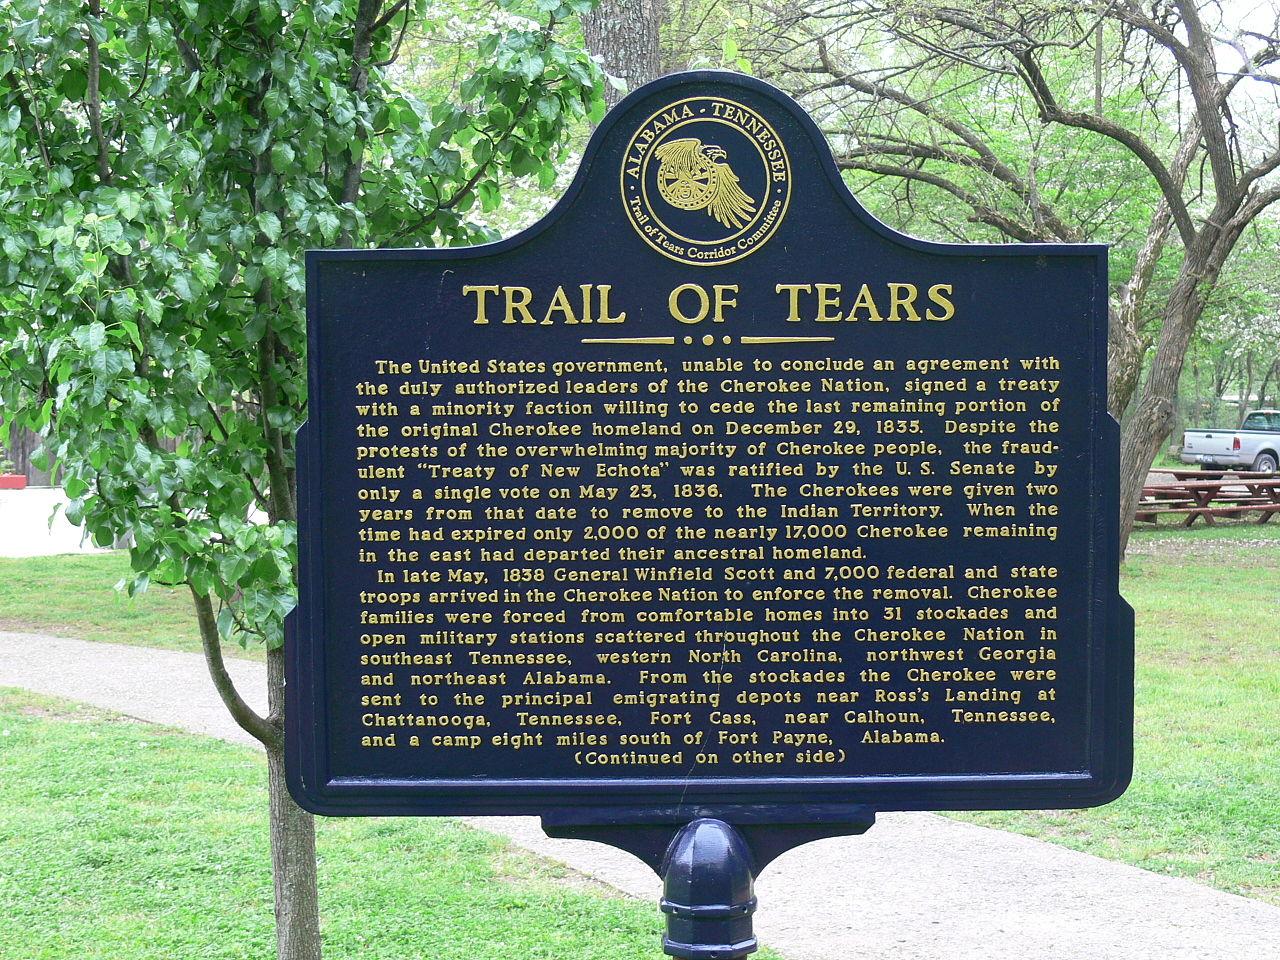 Trail of Tears by Julia Coates | NOOK Book (eBook) | Barnes & Noble®